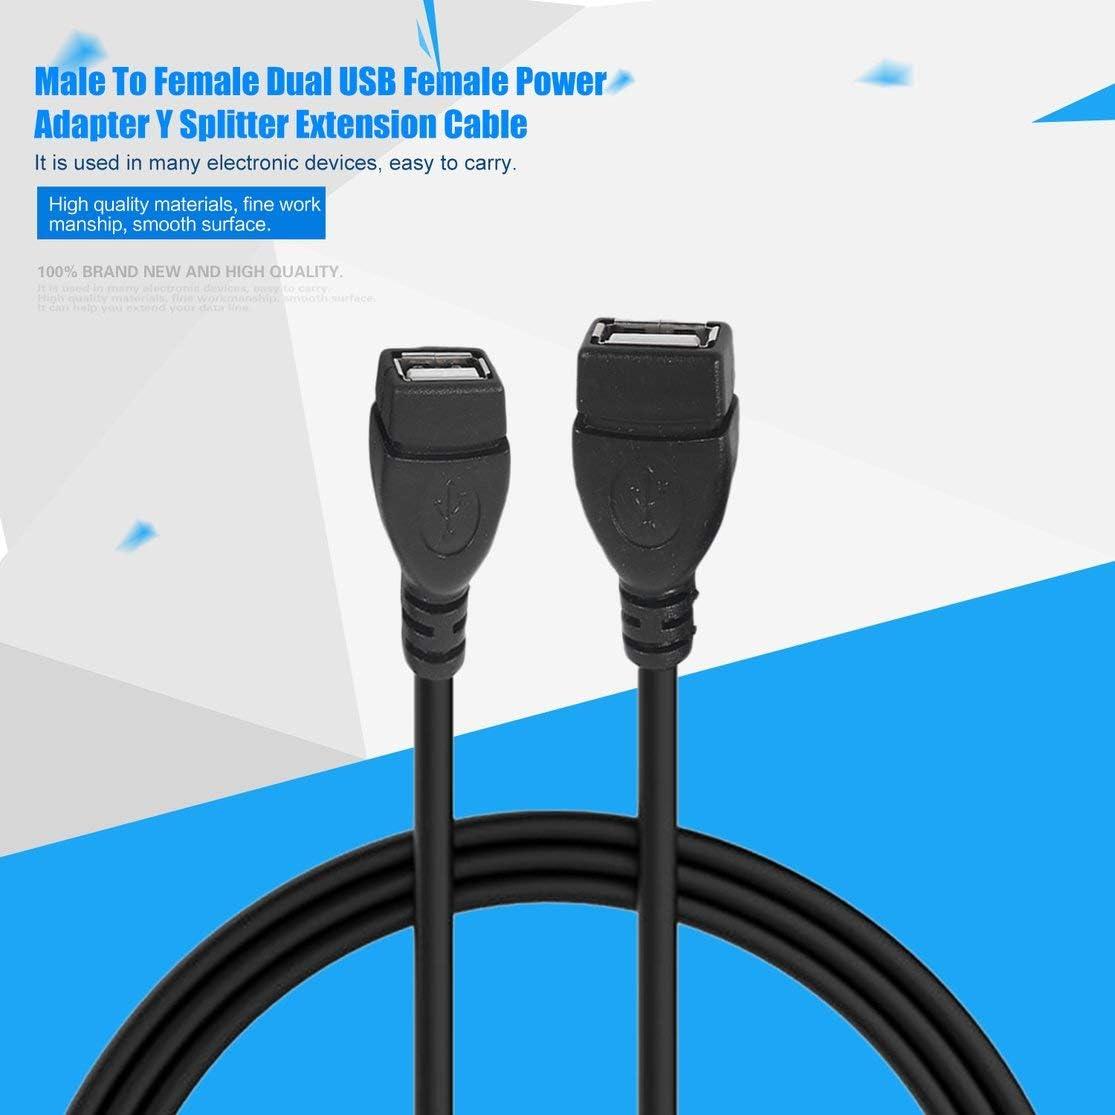 LouiseEvel215 USB 2.0 Un m/âle vers USB Femelle 2 Double Double USB Adaptateur Secteur Femelle Y Splitter Extension Cable Extension Cable